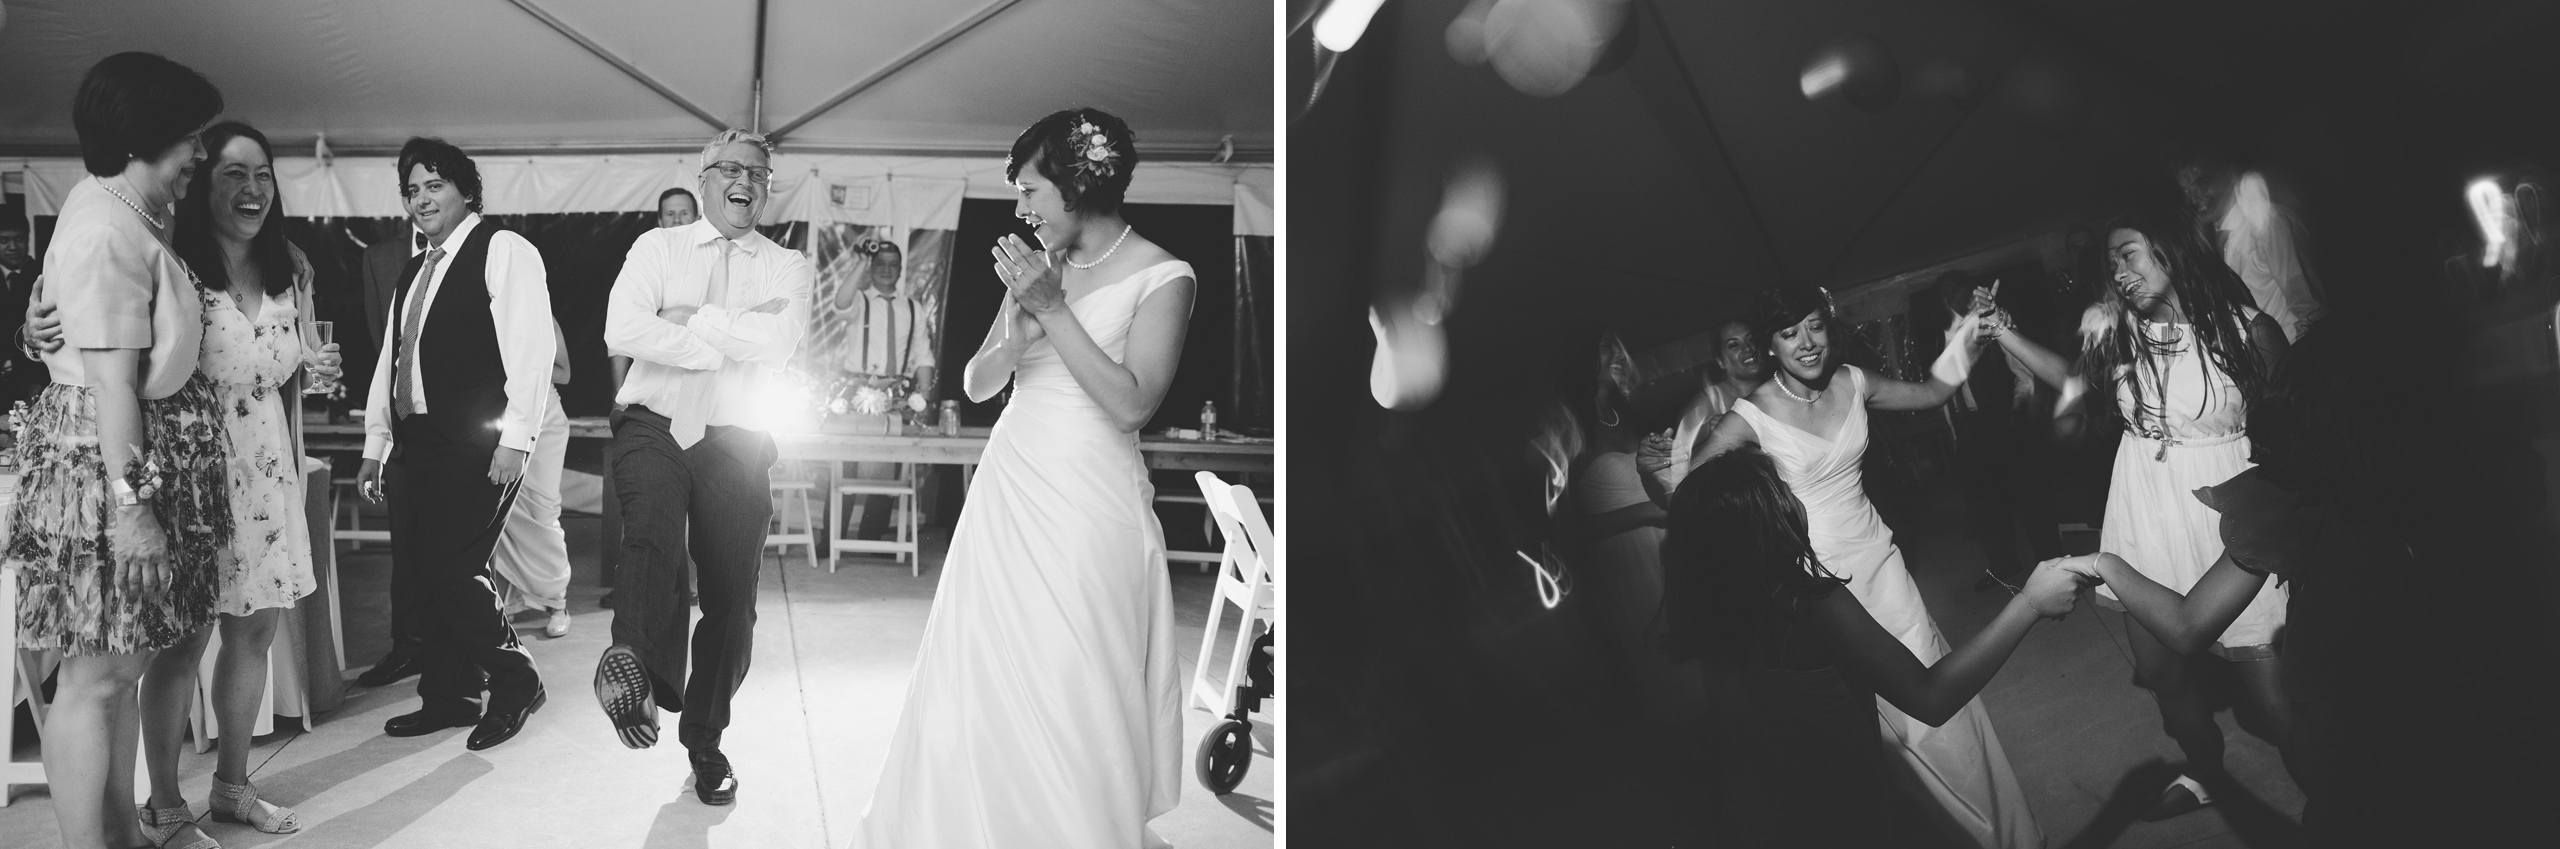 wedding reception tent niagara on the lake southbrook winery